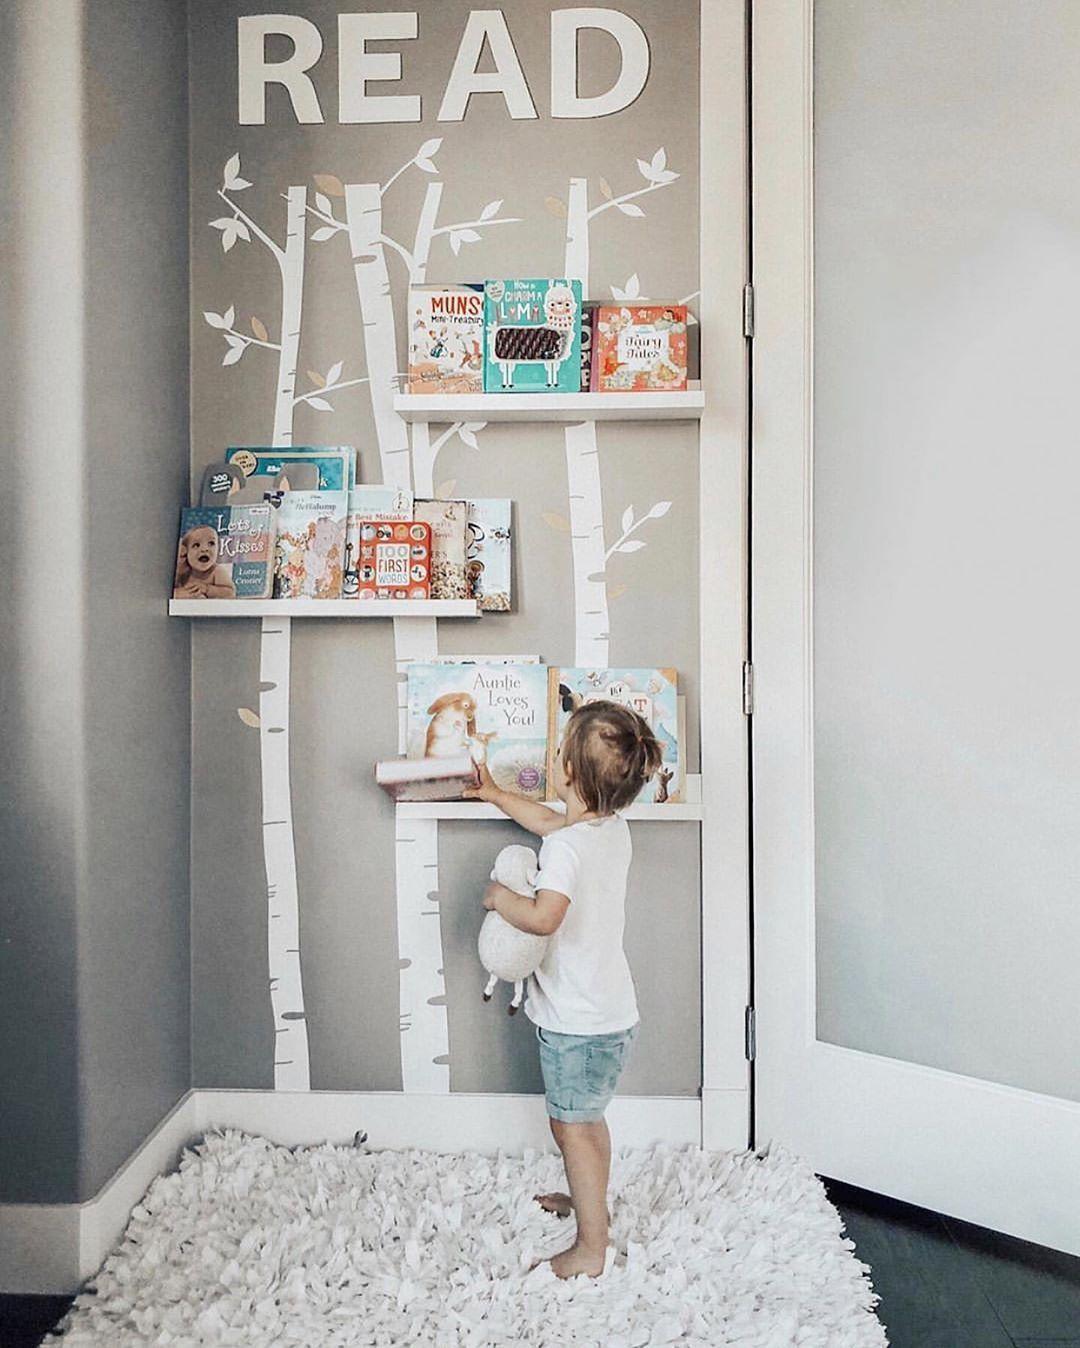 Top Furniture Brand Names Home Decor Online Kids Interior Design Home Decor